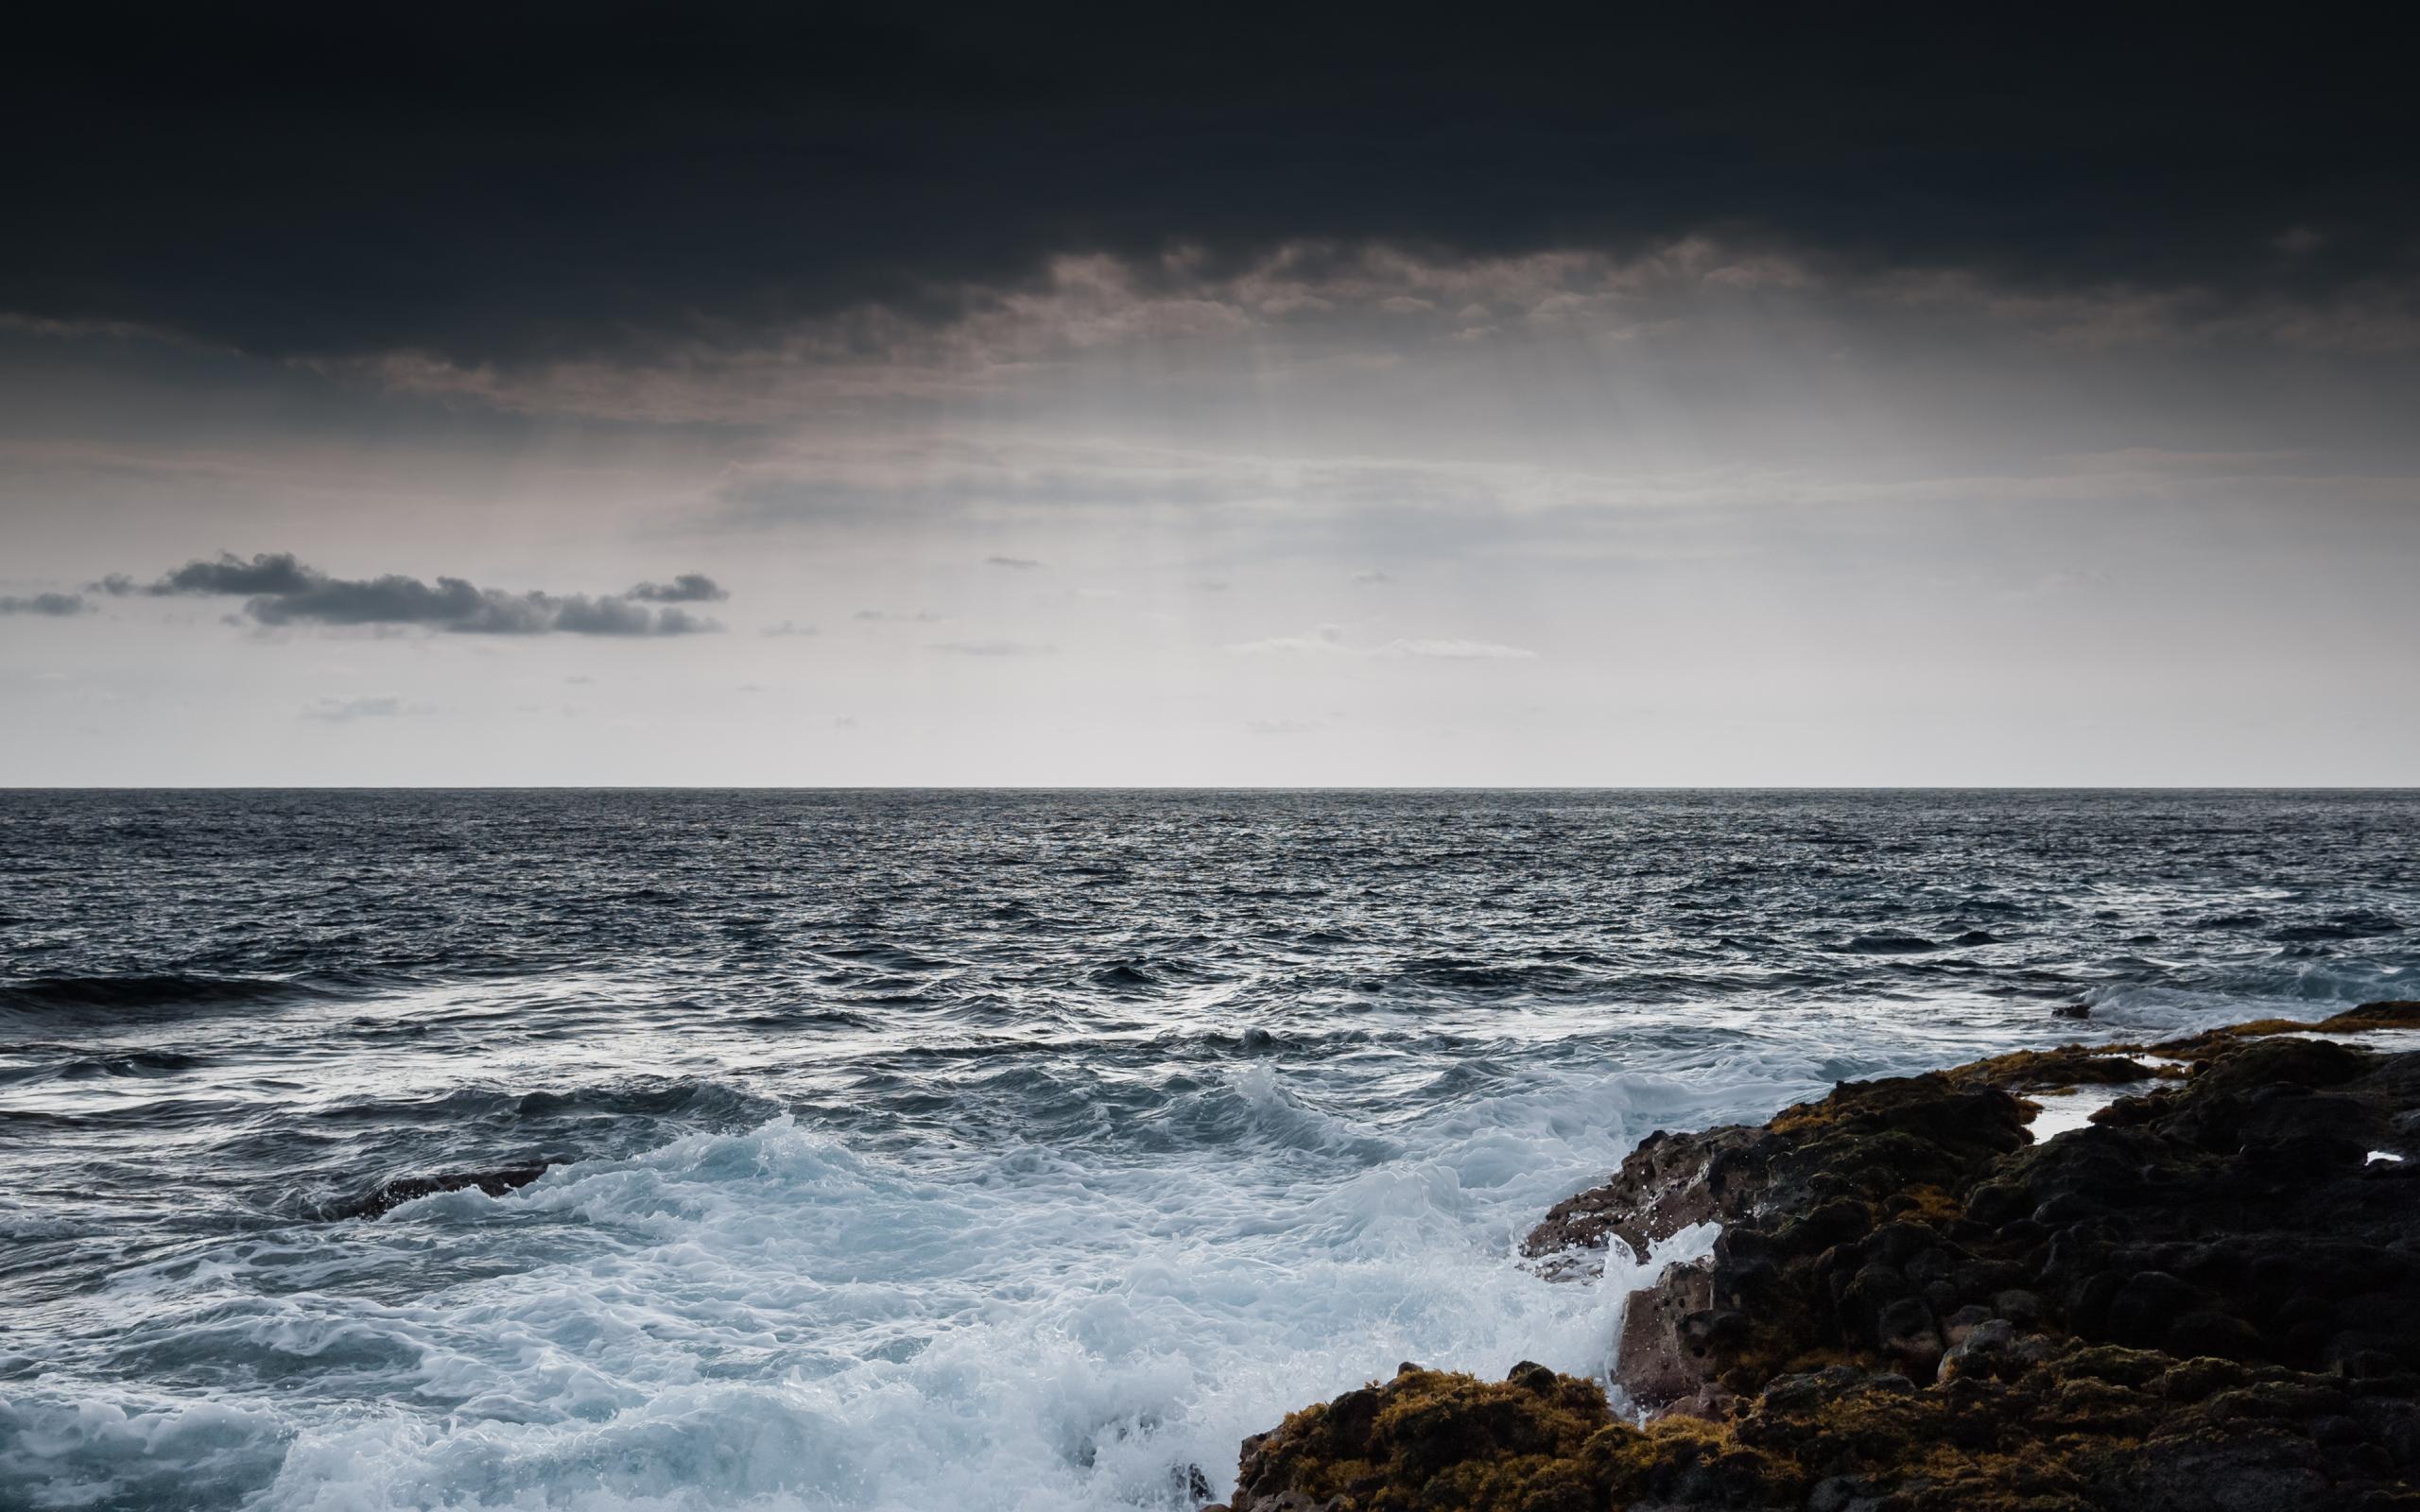 море мрачное фото кладбище